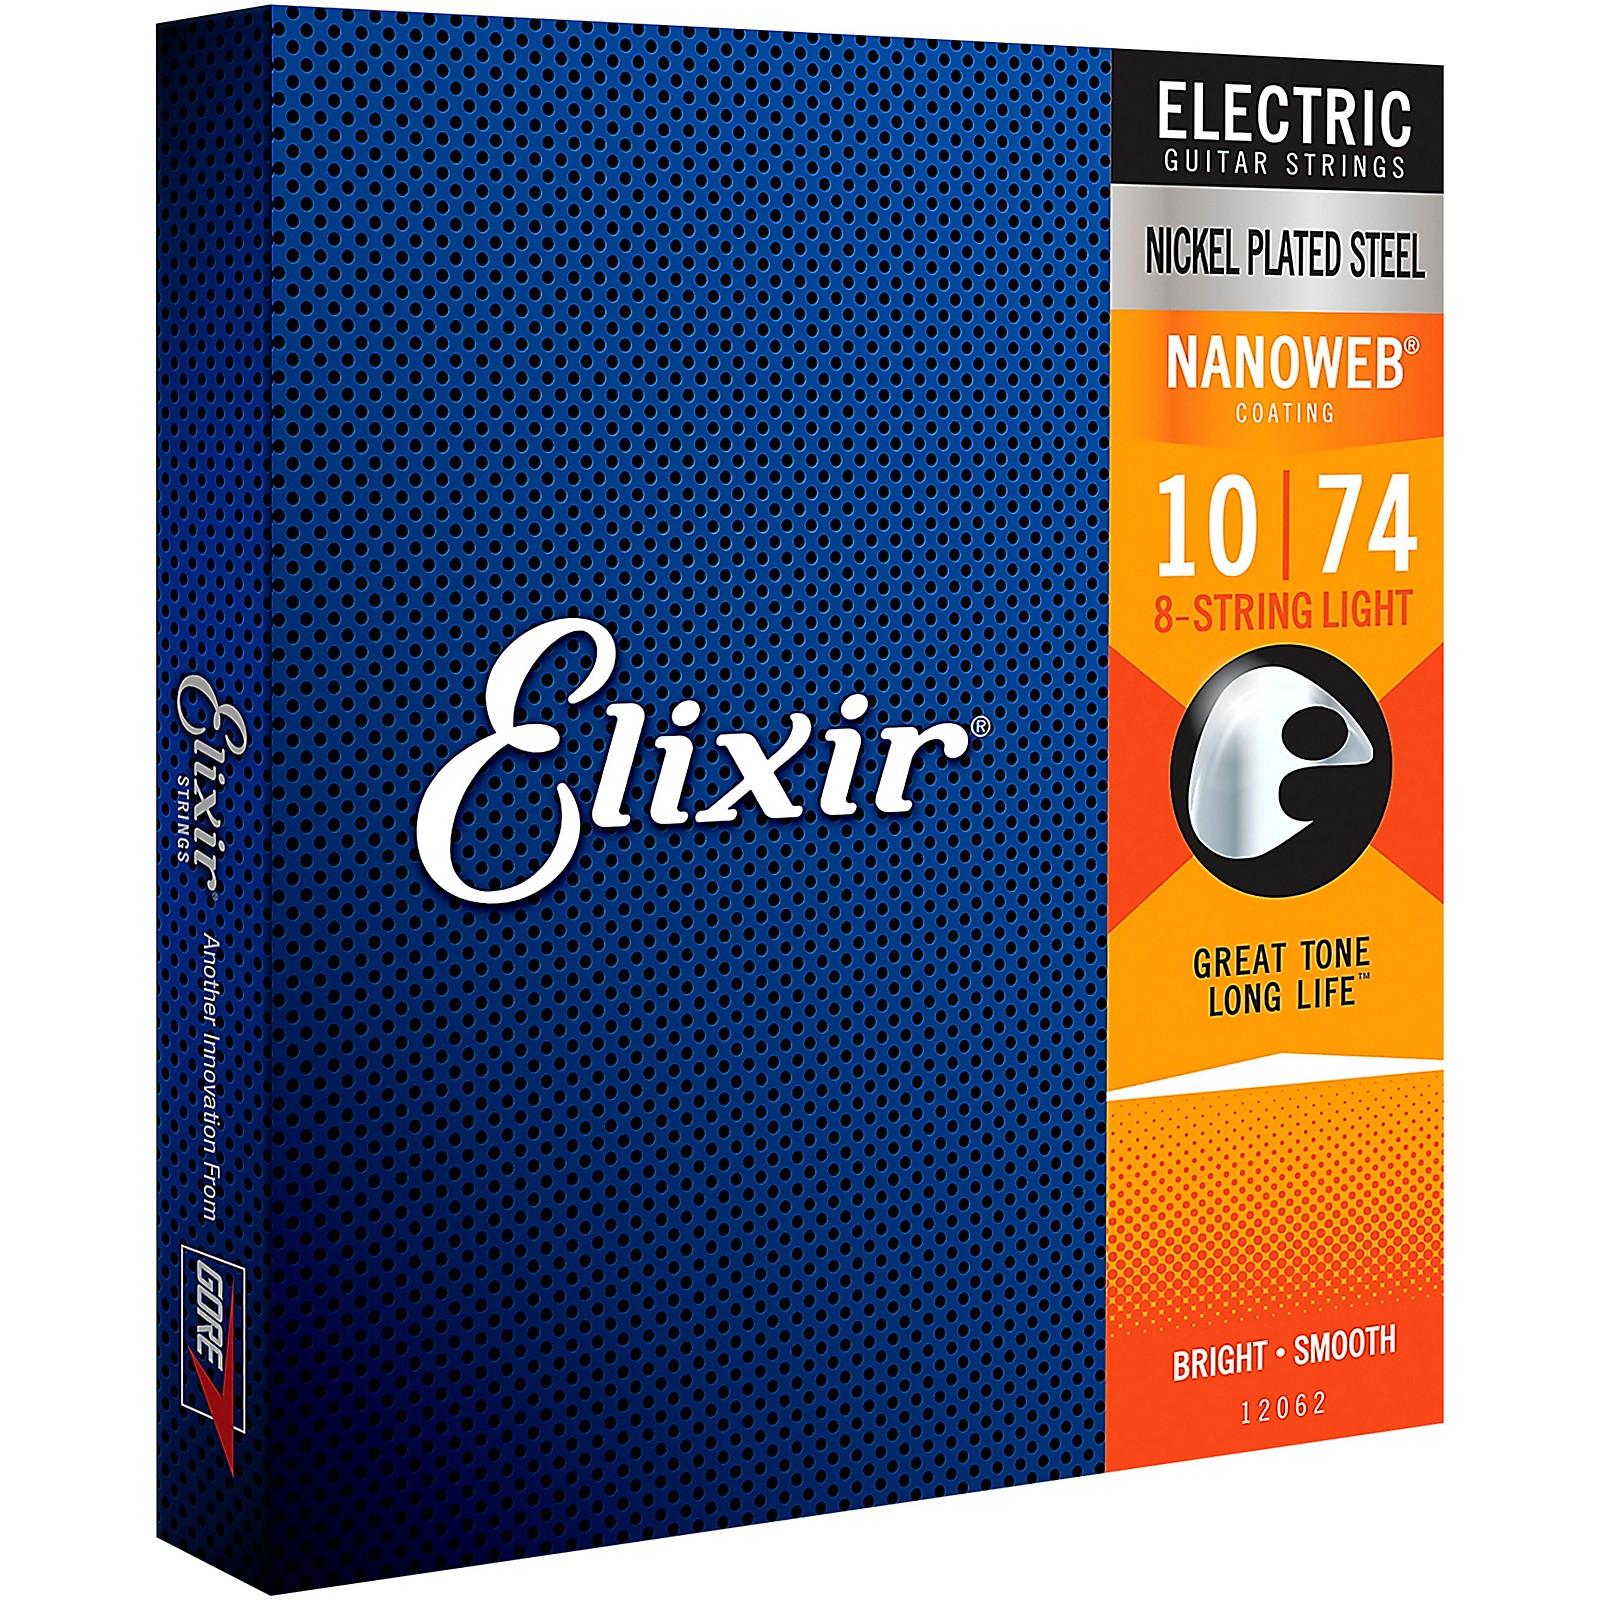 Elixir 8-String Electric Guitar Strings with NANOWEB Coating